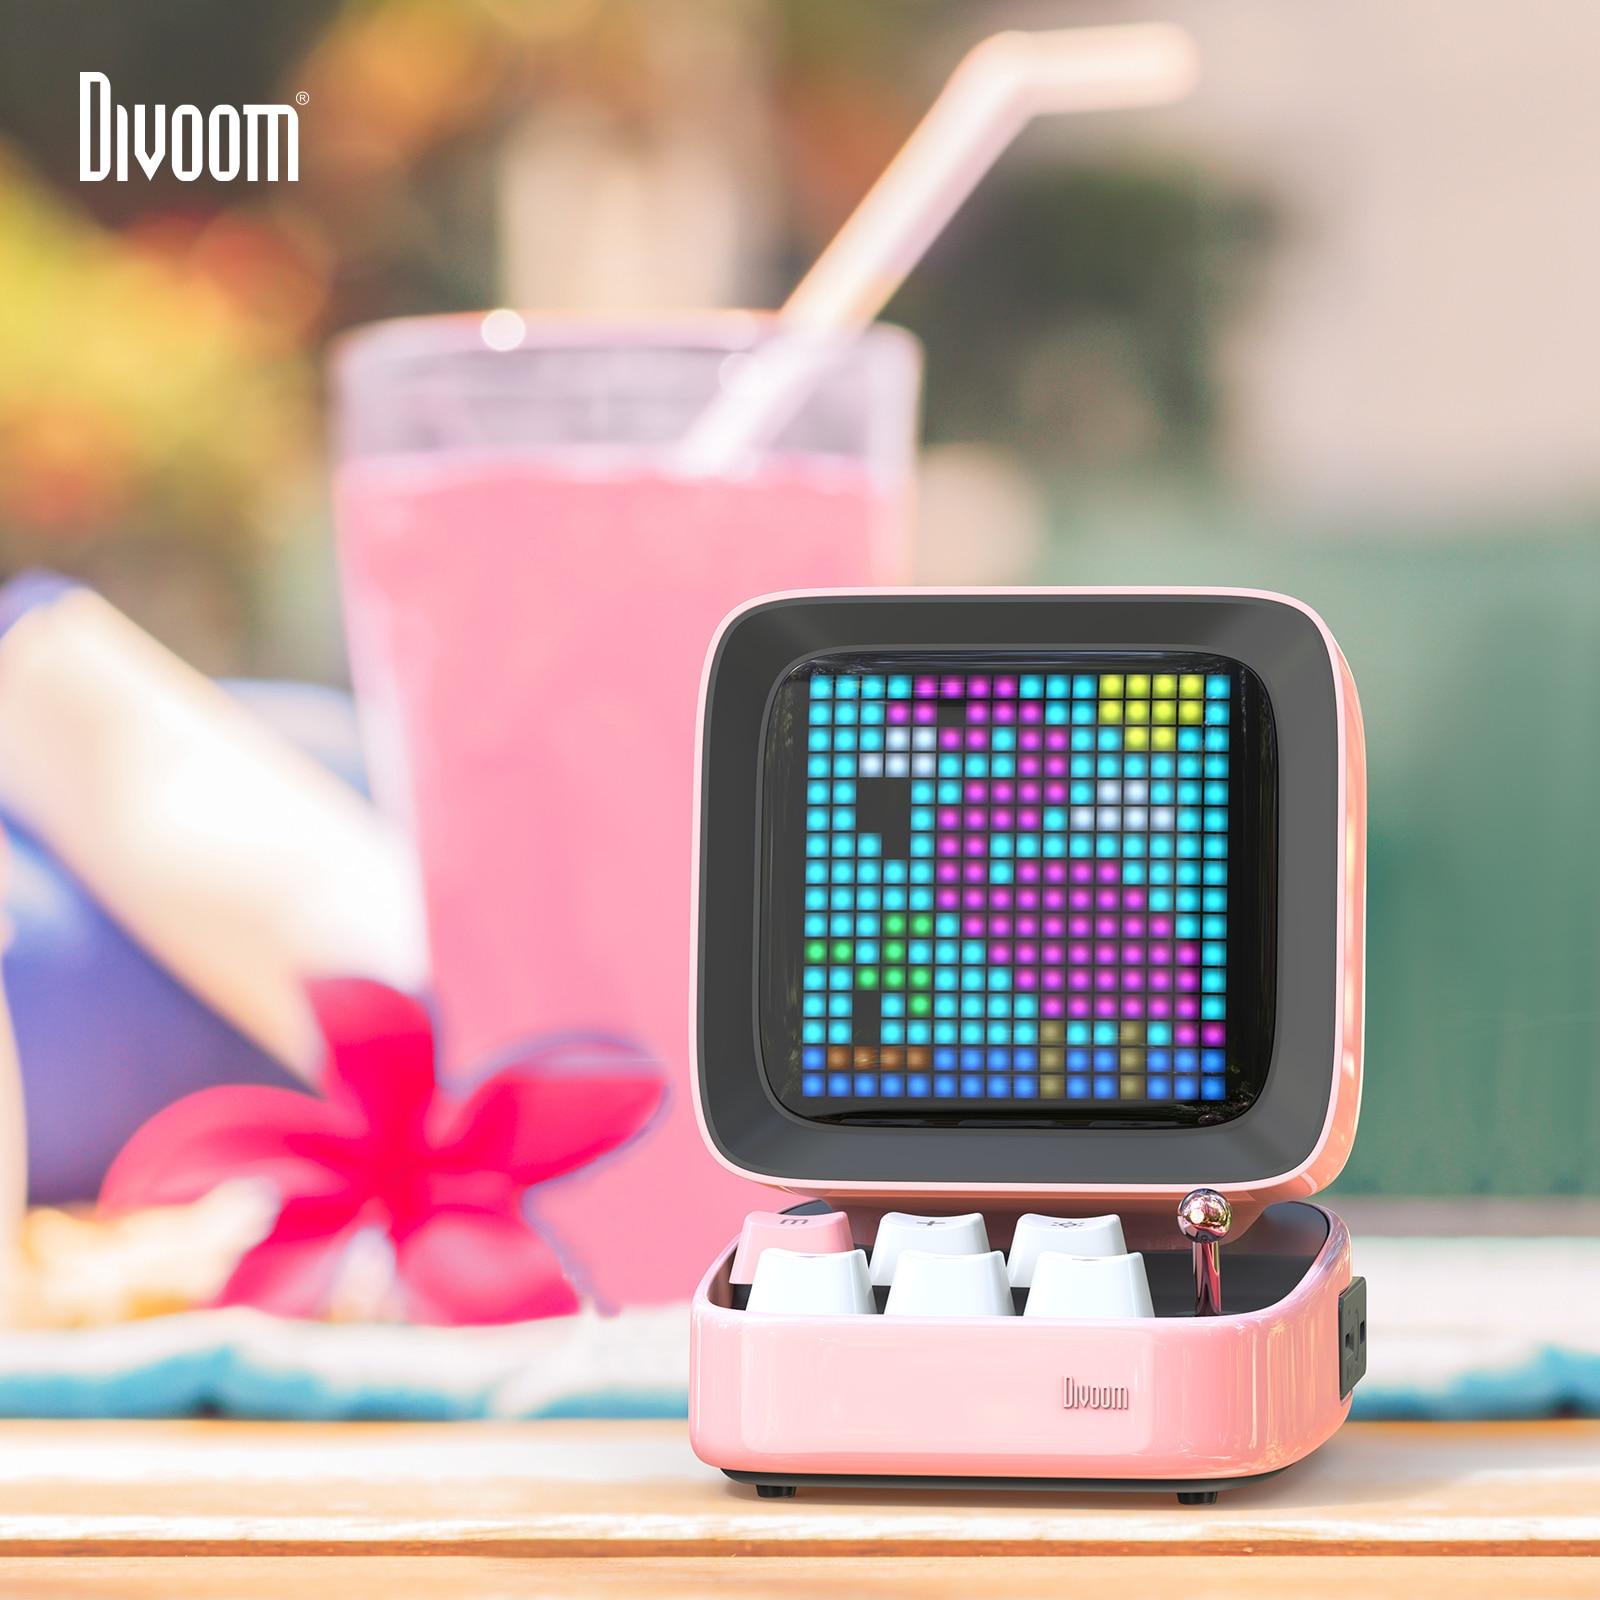 Promo Divoom Ditoo Retro Pixel Art Bluetooth Portable Speaker Alarm Clock DIY LED Display Board, New Year Gift Home Light Decoration